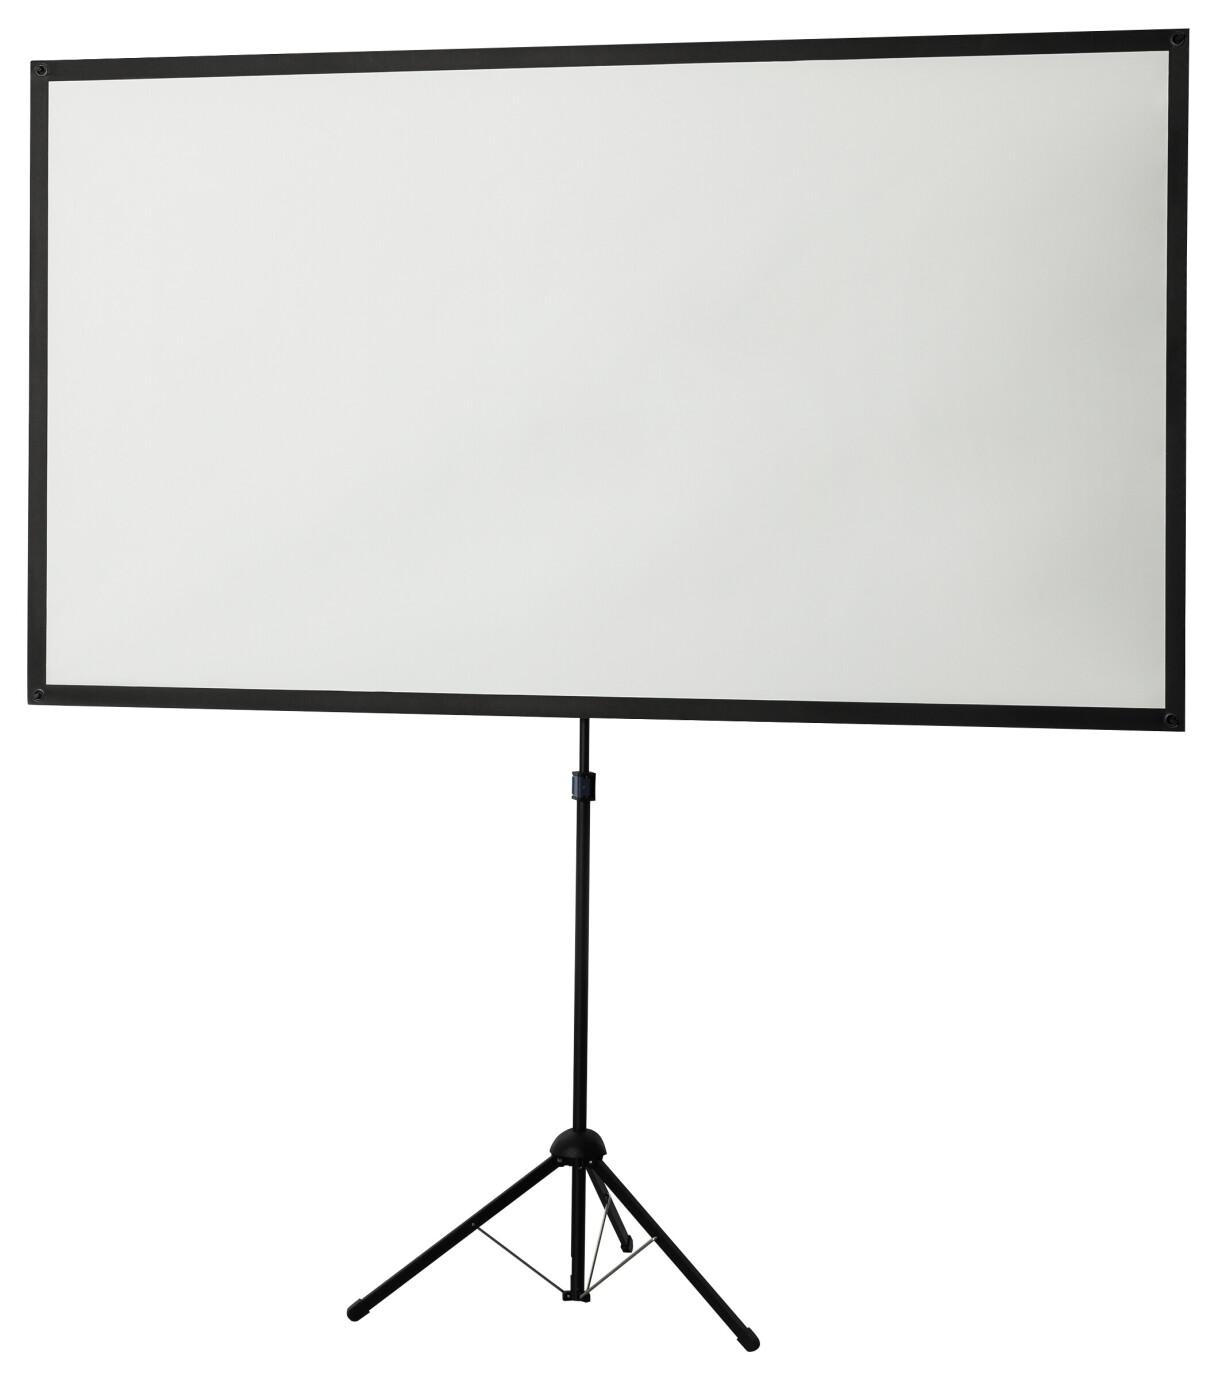 "celexon Ultra-Leightweight 199 x 112 cm ekran na trójnogu 16:9 (90"")"